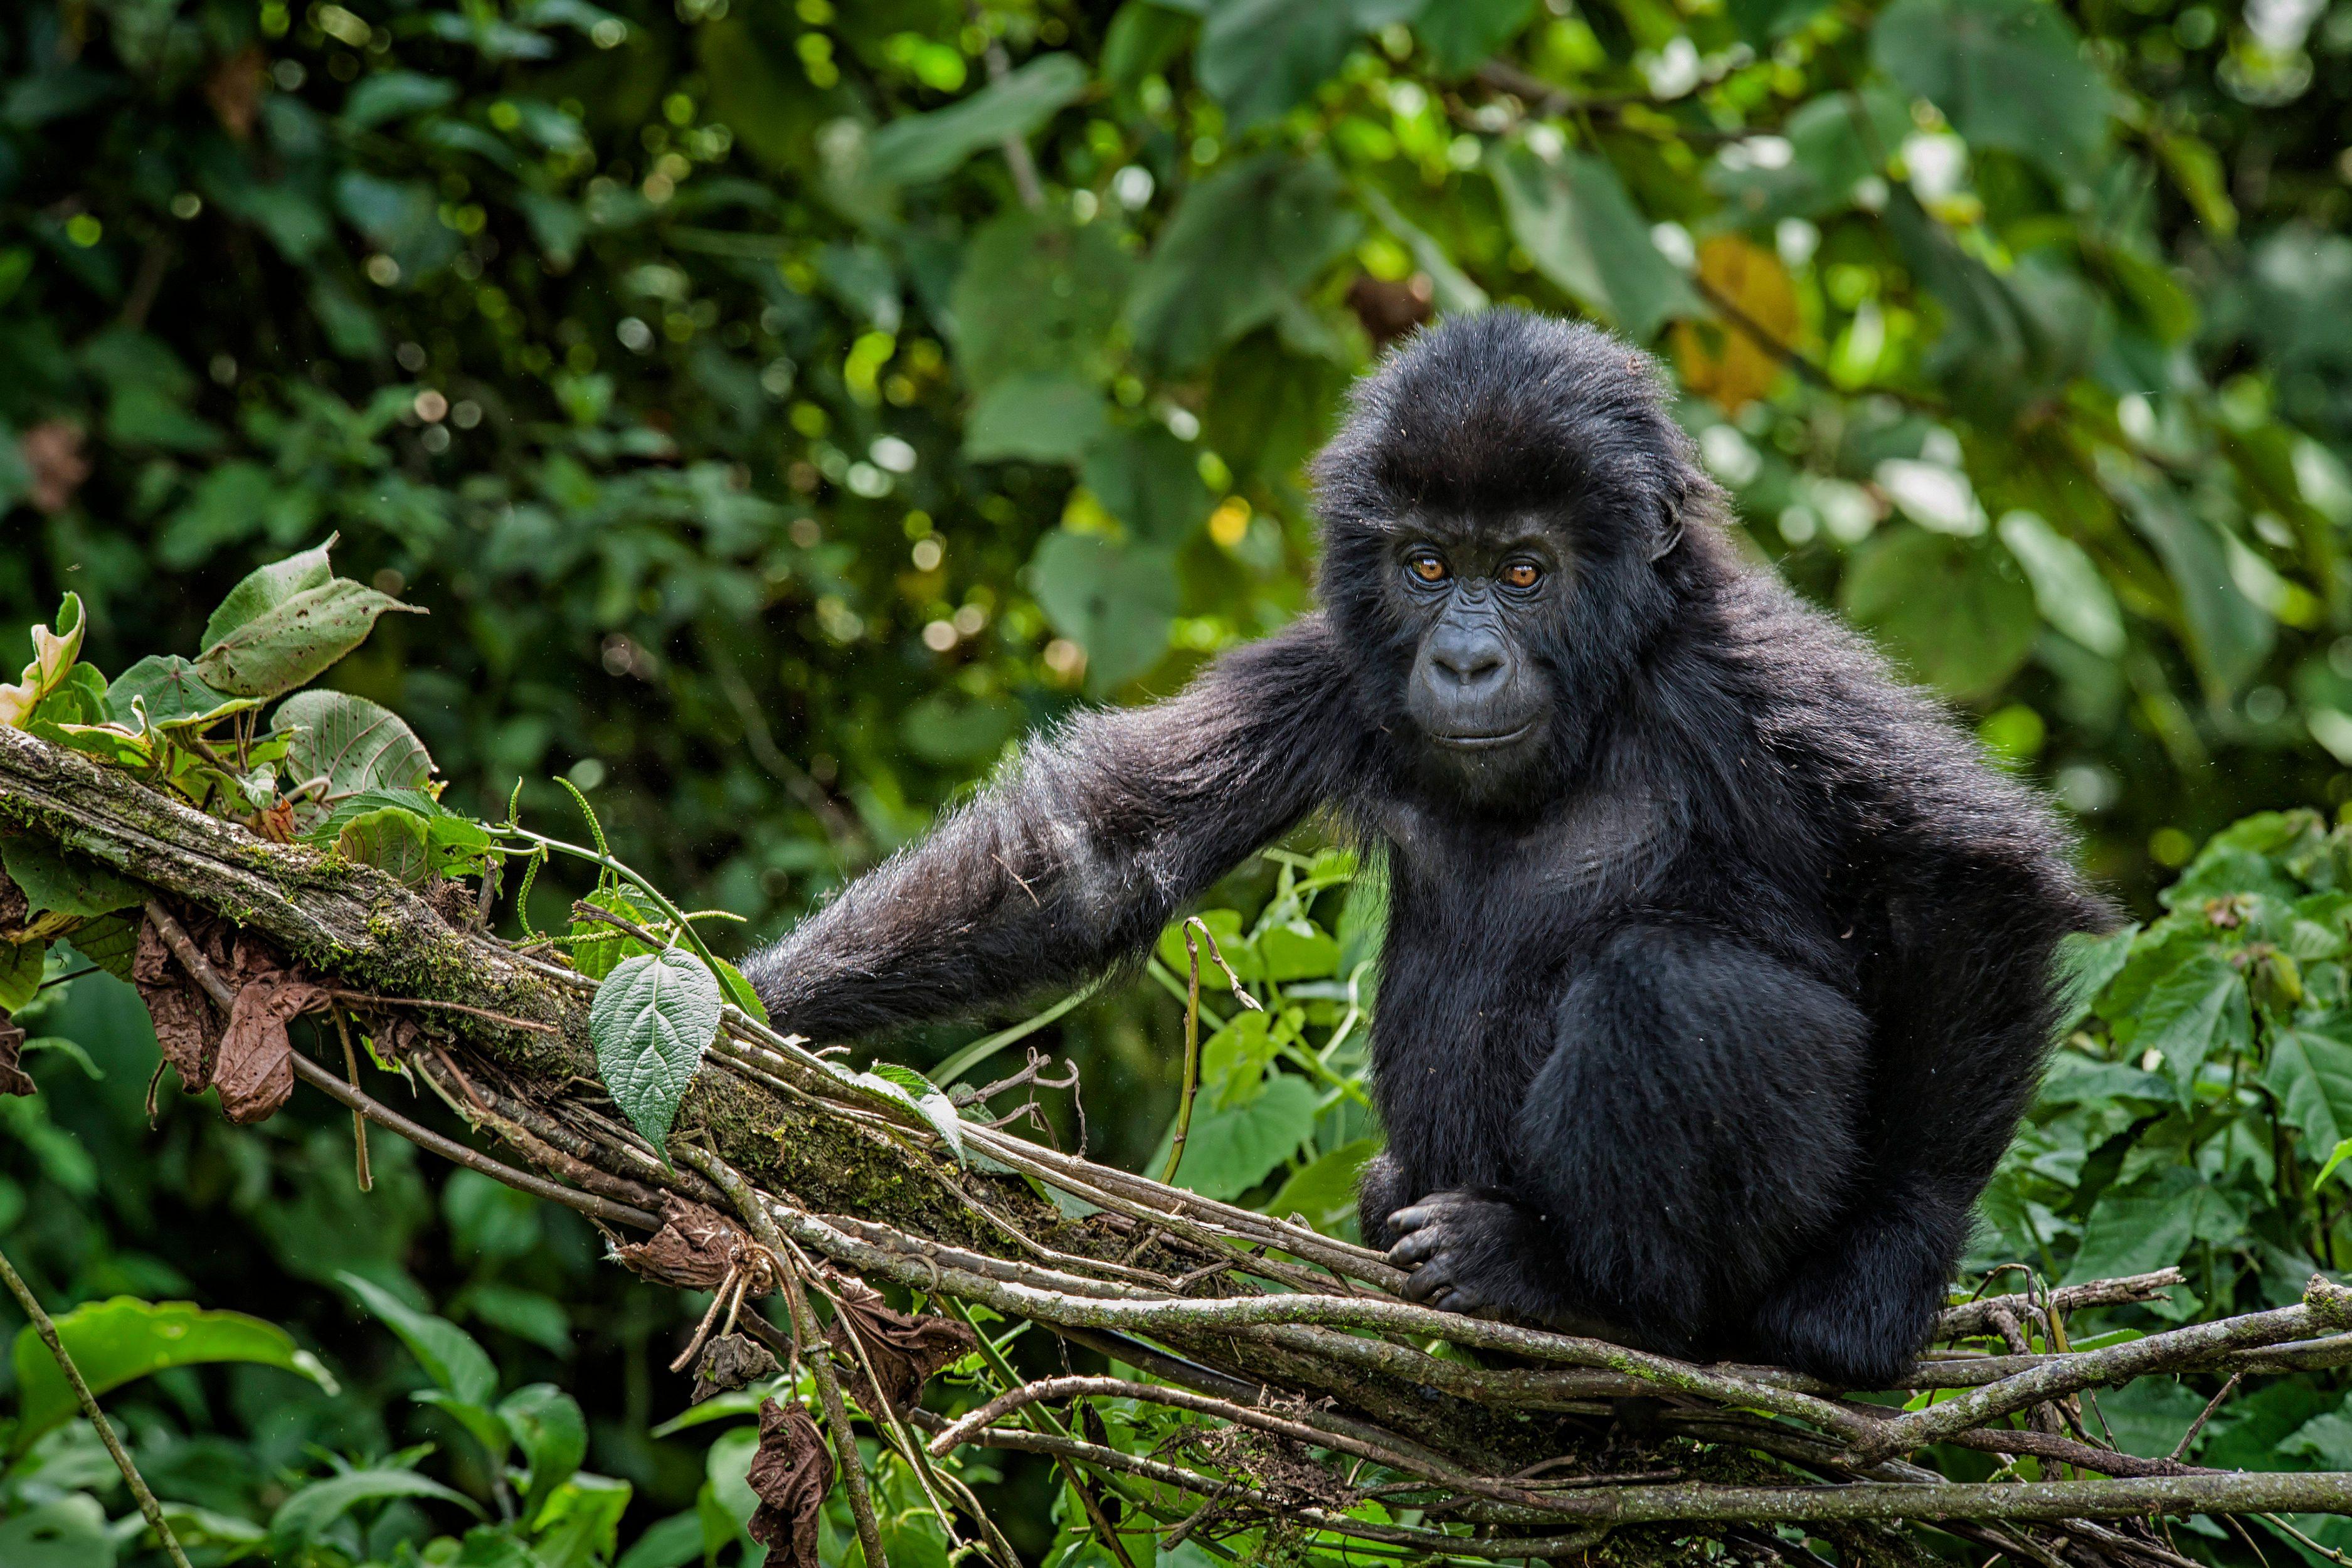 Baby Eastern Lowland Gorilla, wildlife shot, Congo